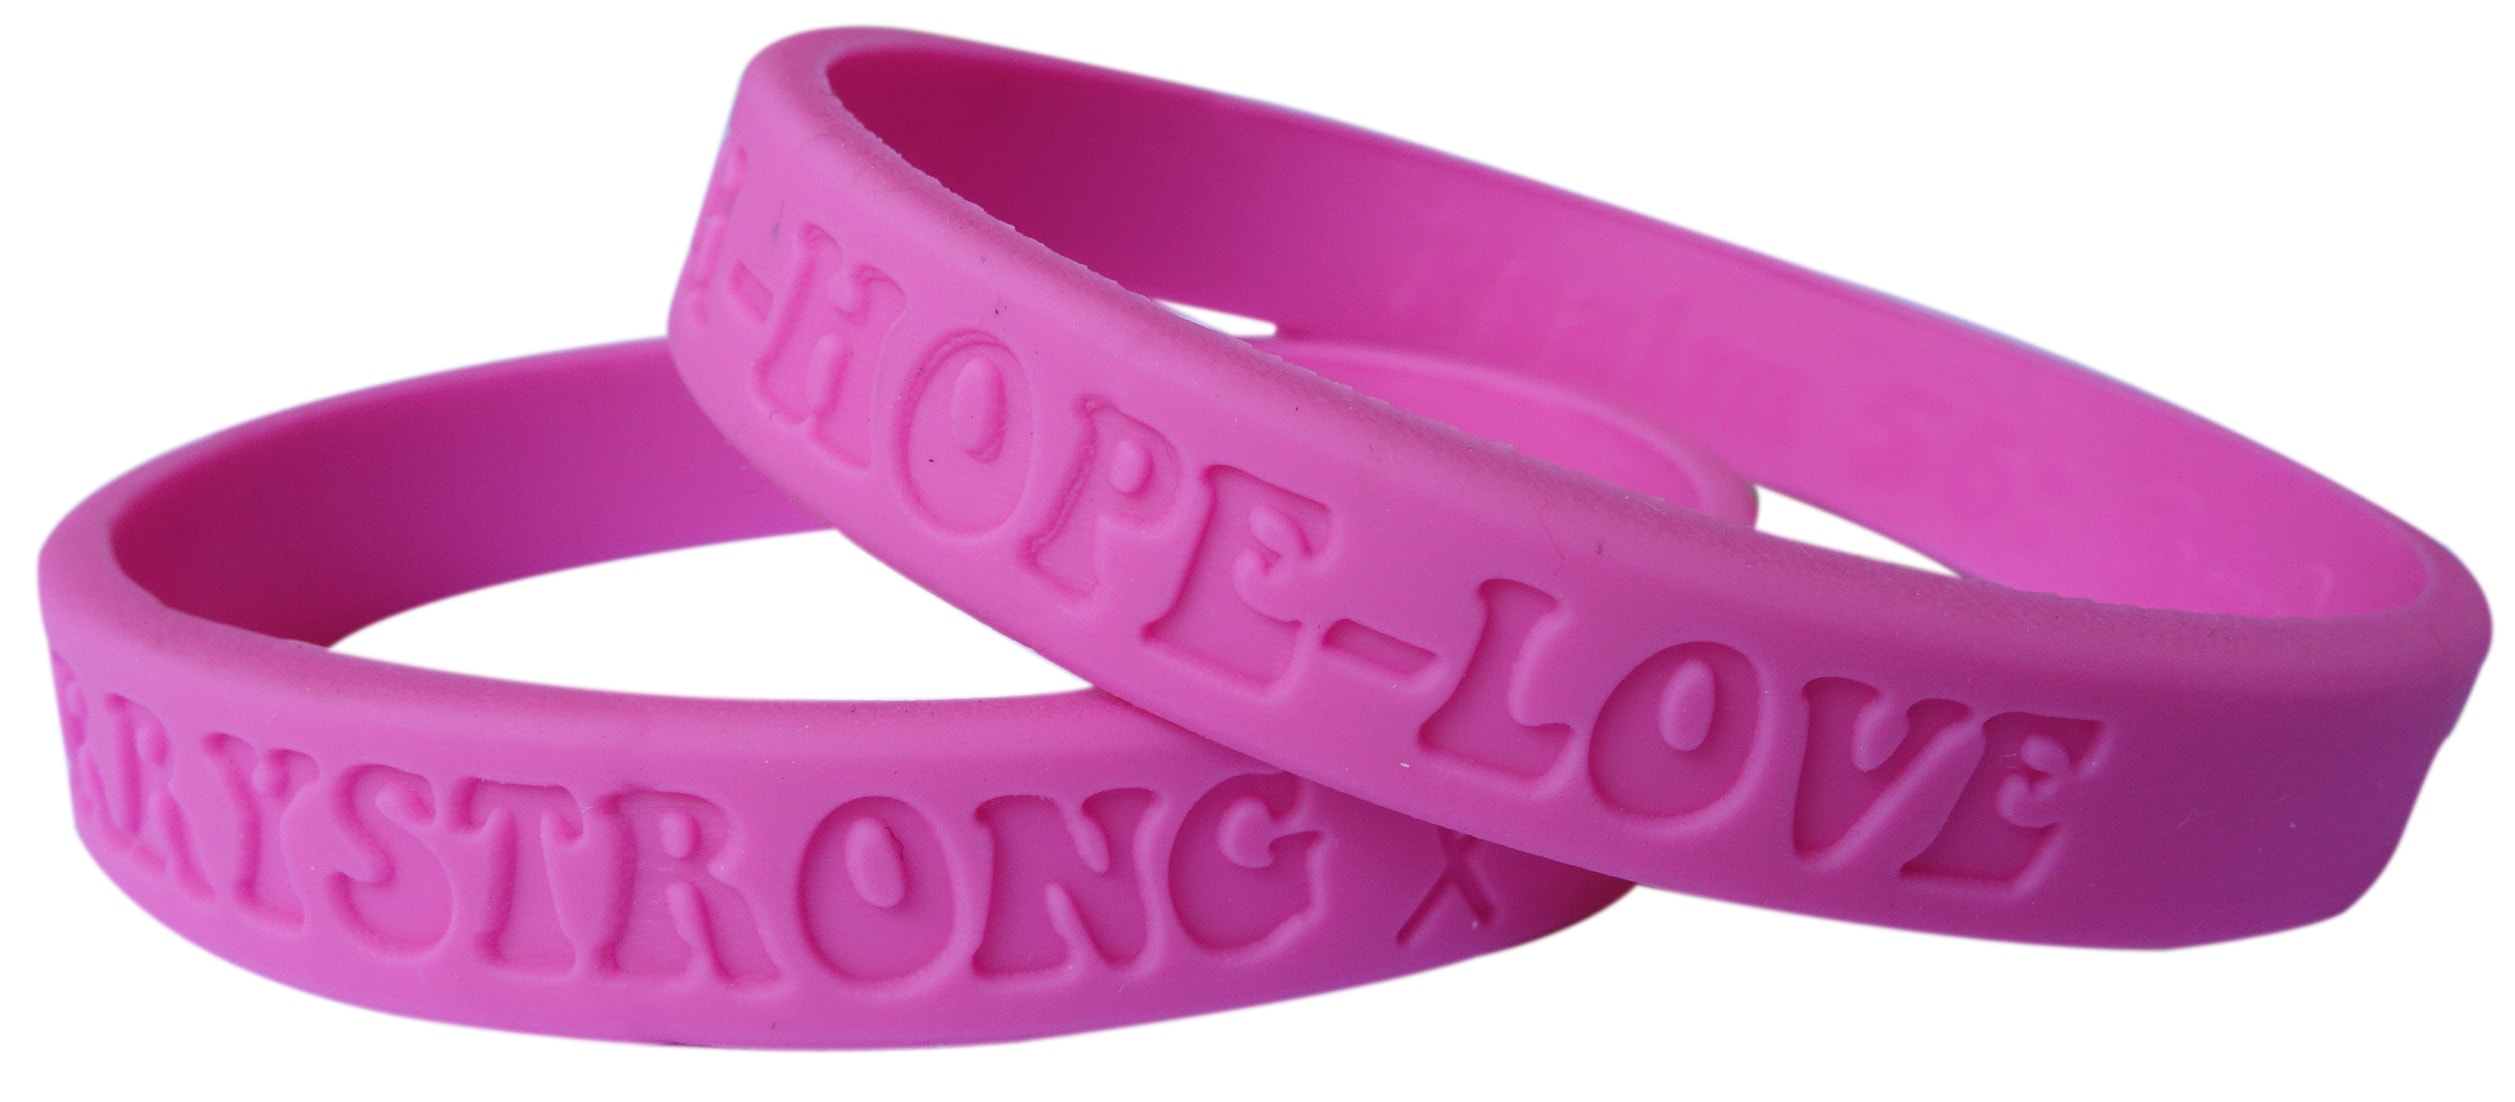 breast cancer awareness wristband 5